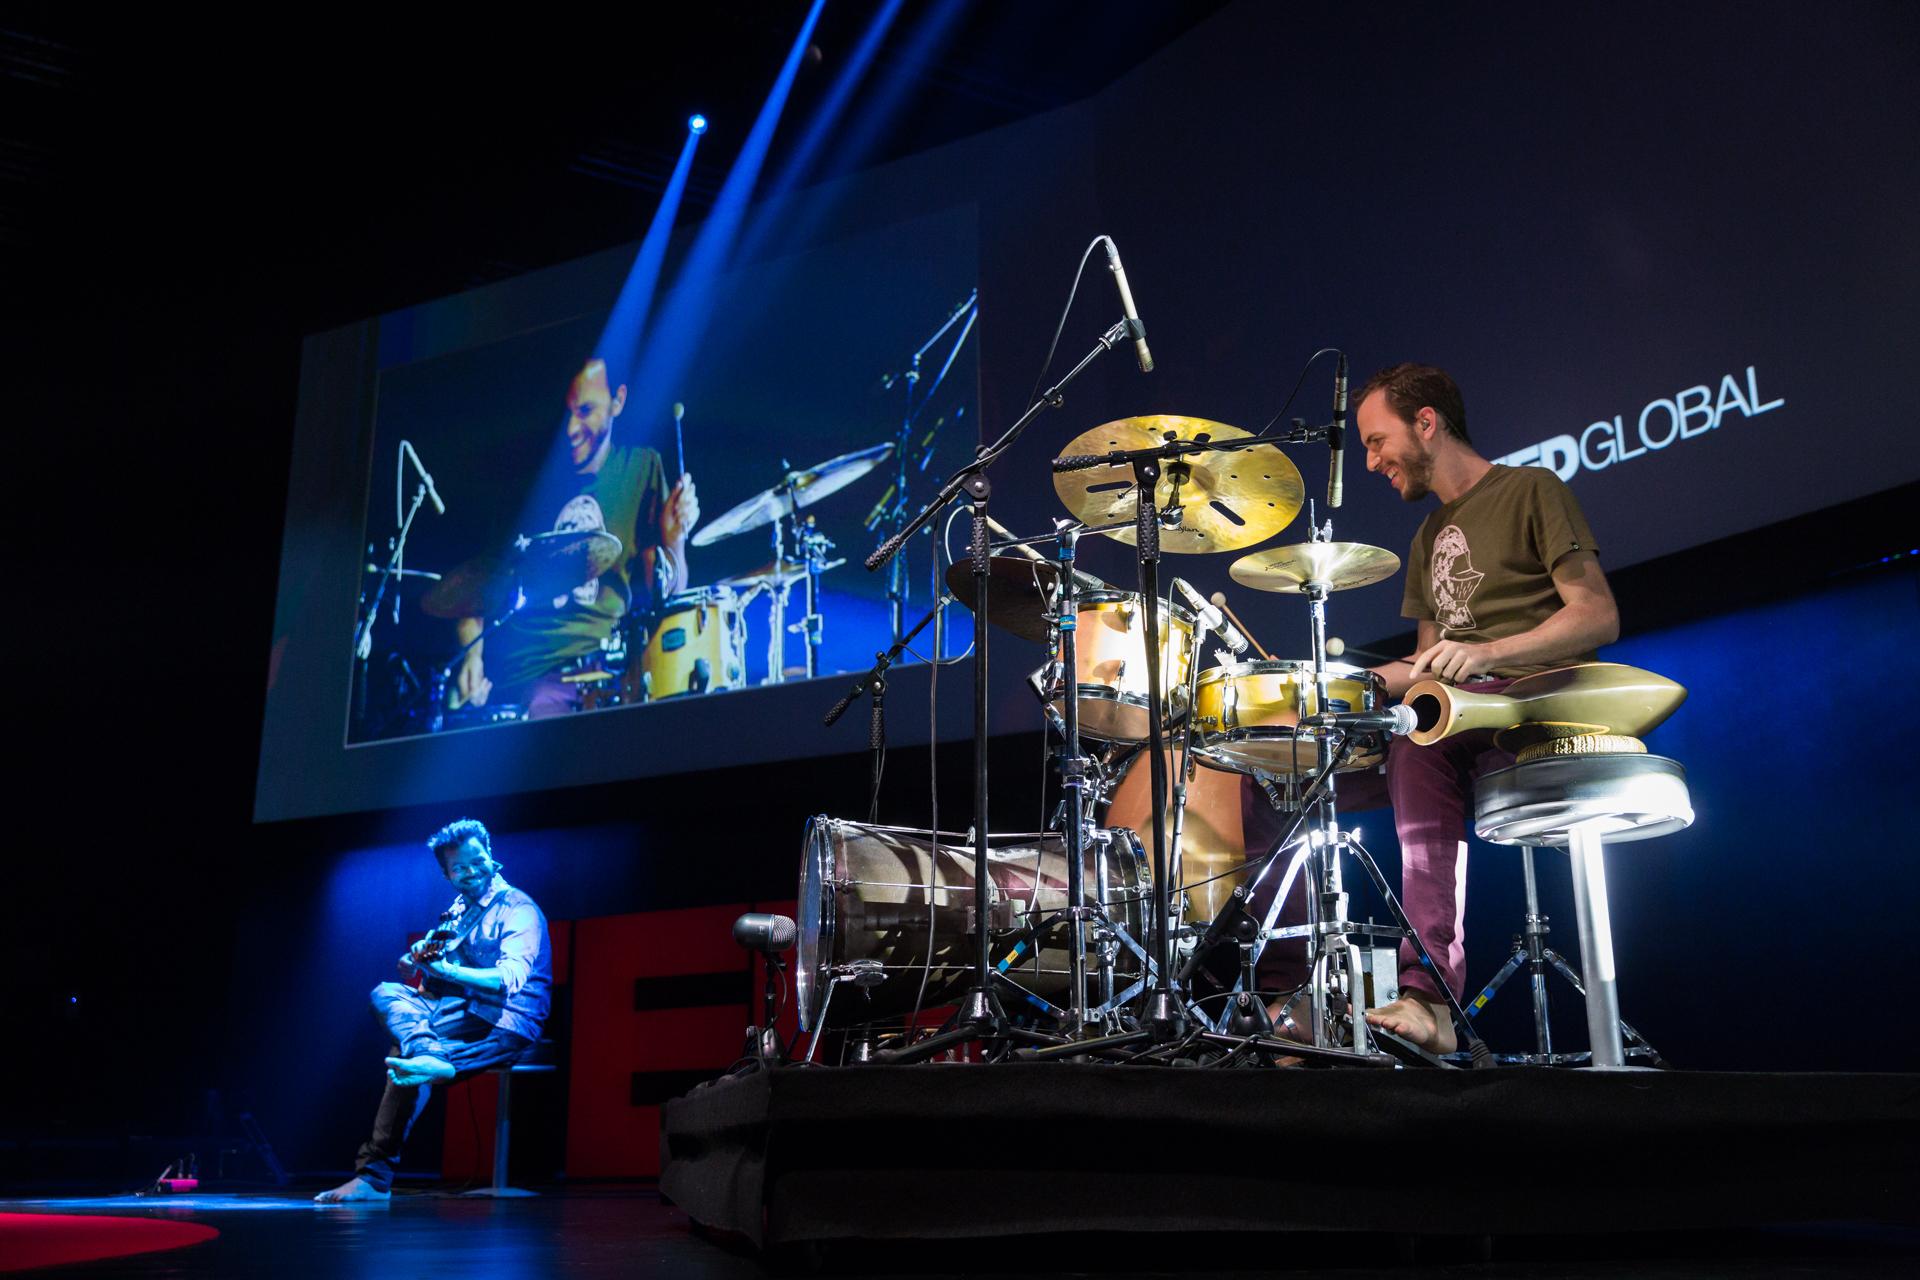 Circle of Sound performs at TEDGlobal 2014. Photo: James Duncan Davidson/TED